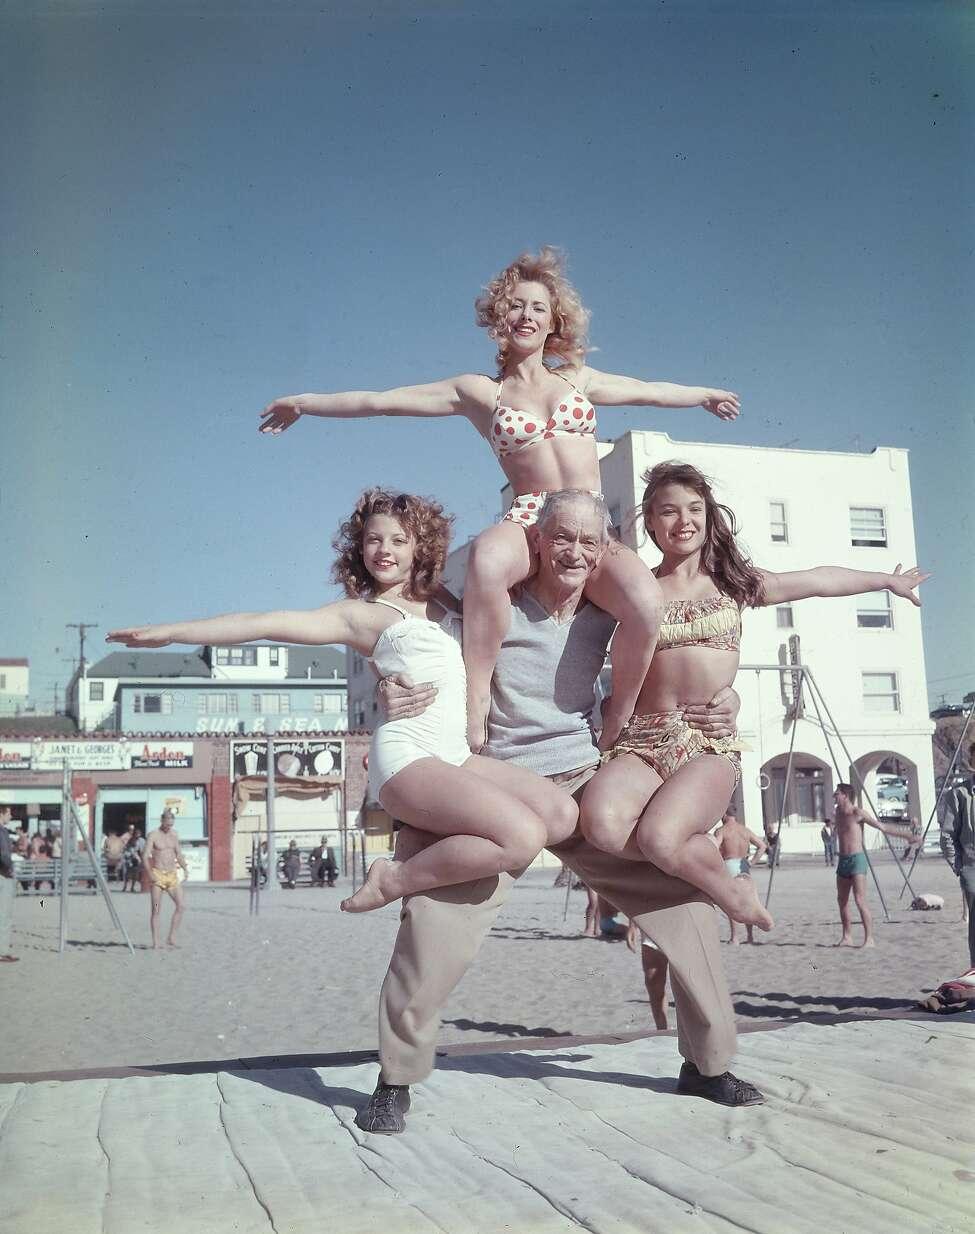 68-year-old Barney Frye lifts three women (L-R: Joan Greenman, Sherry Lee Evans, Kim Curtis) on the boardwalk, Muscle Beach, Santa Monica, California, 1956.